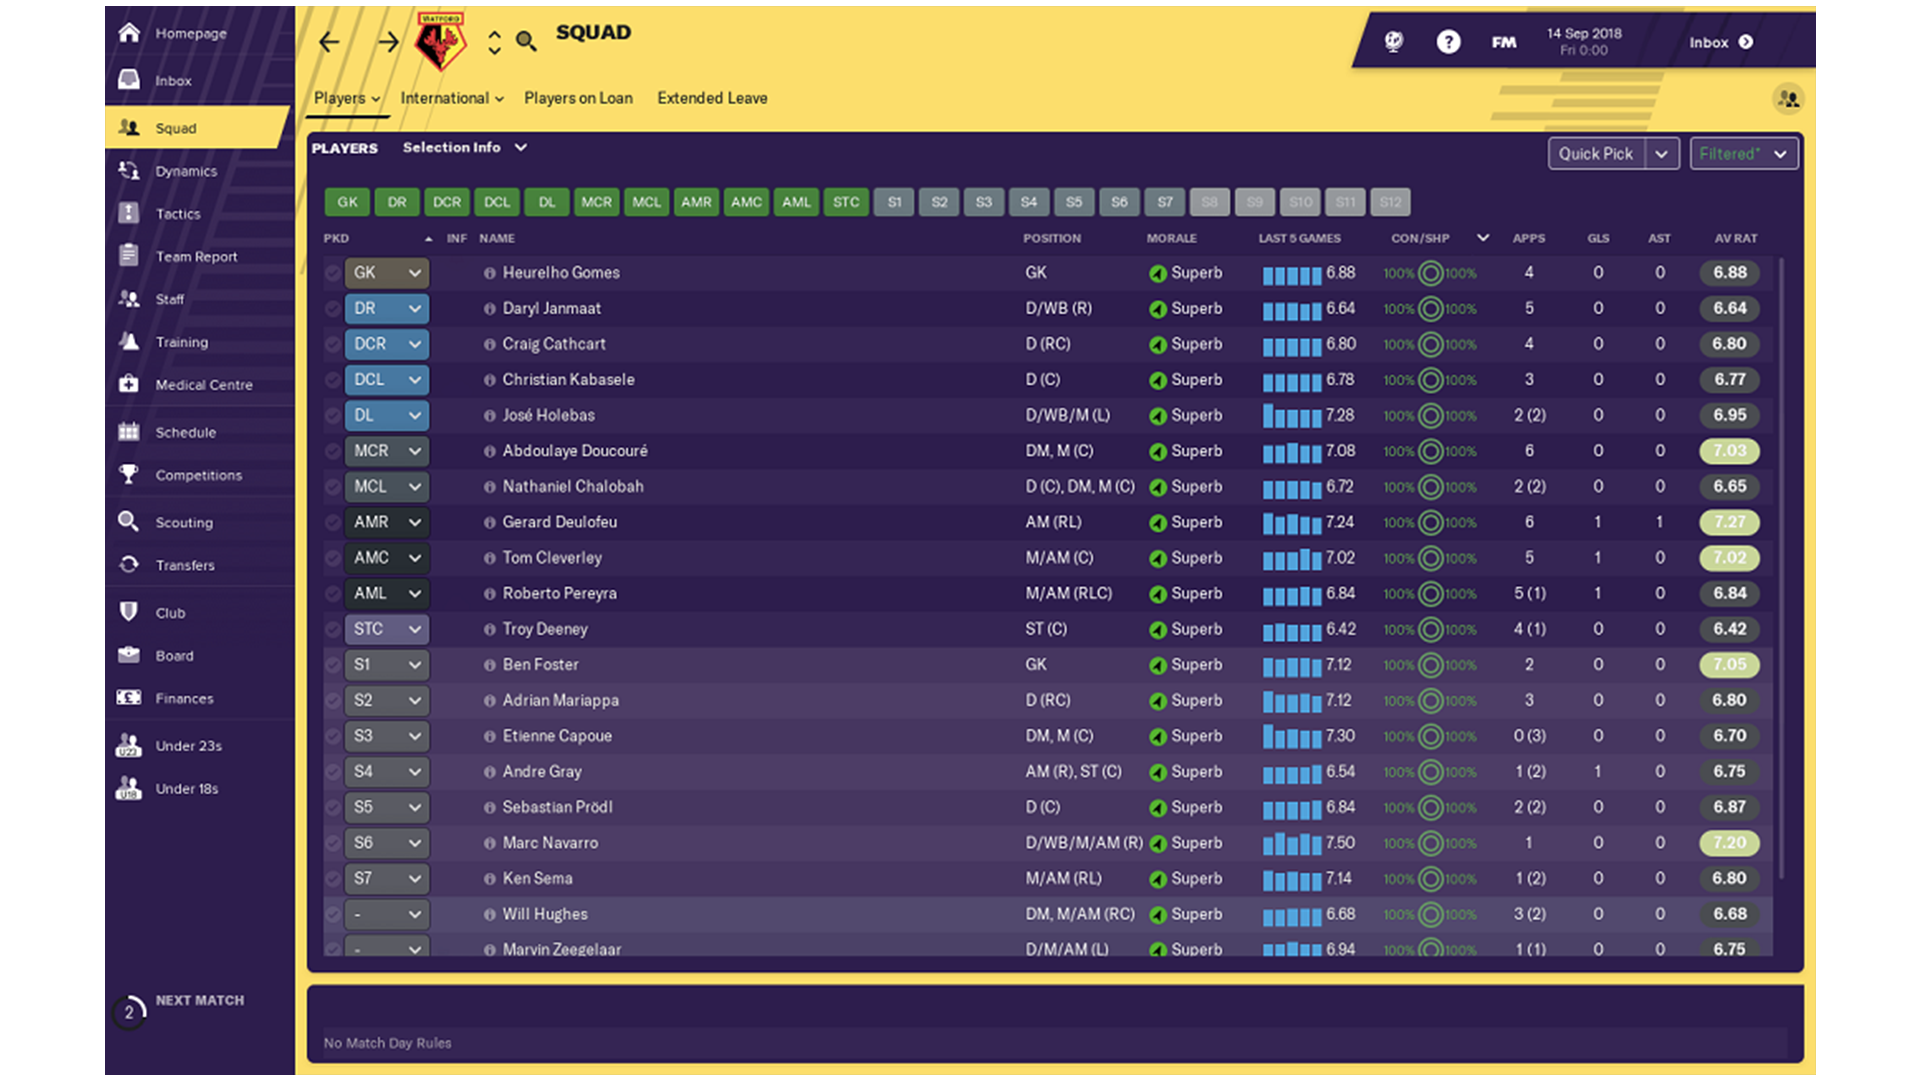 Football Manager 2019 Features Full Bundesliga